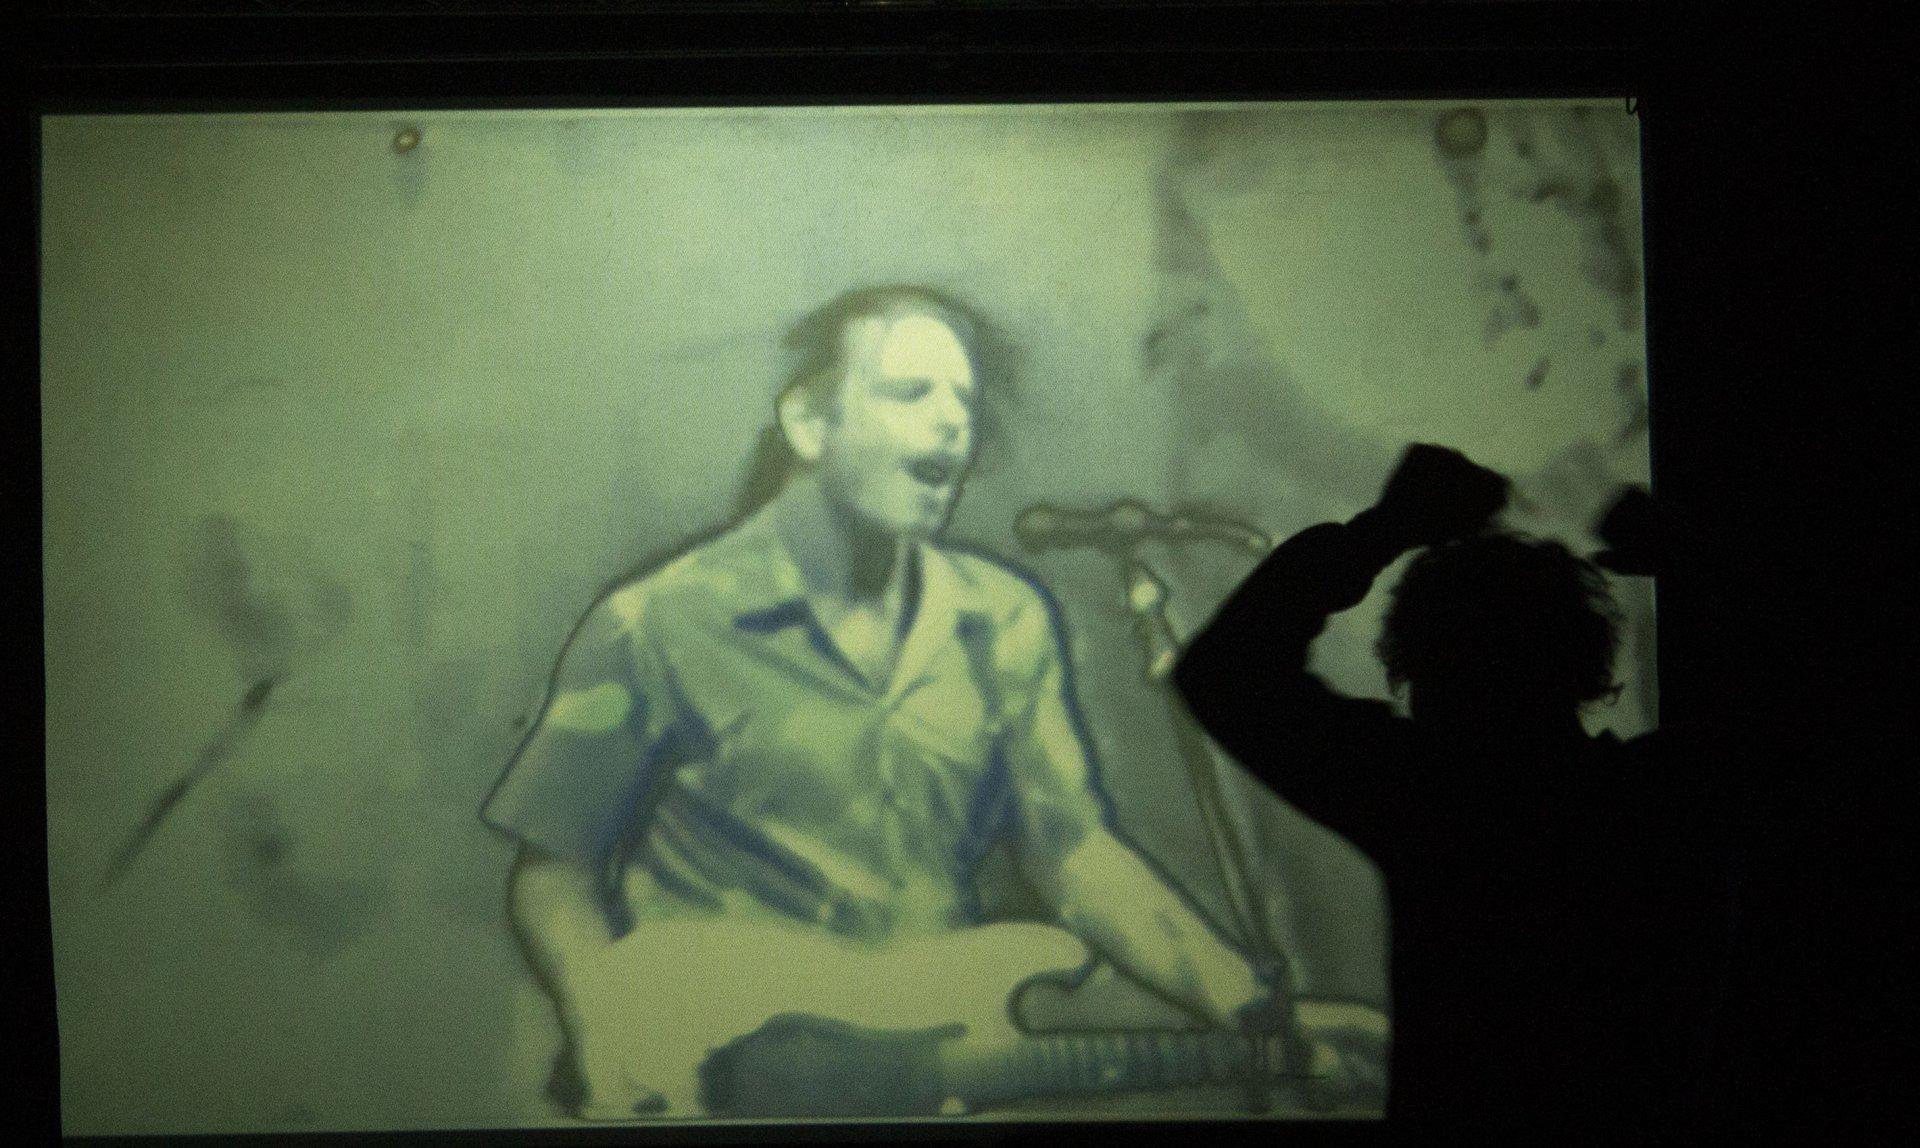 Grateful Dead fan, Will Ozone dancing all over the dance floor. Saturday Feb. 2. | Photo by Skylar Gaven